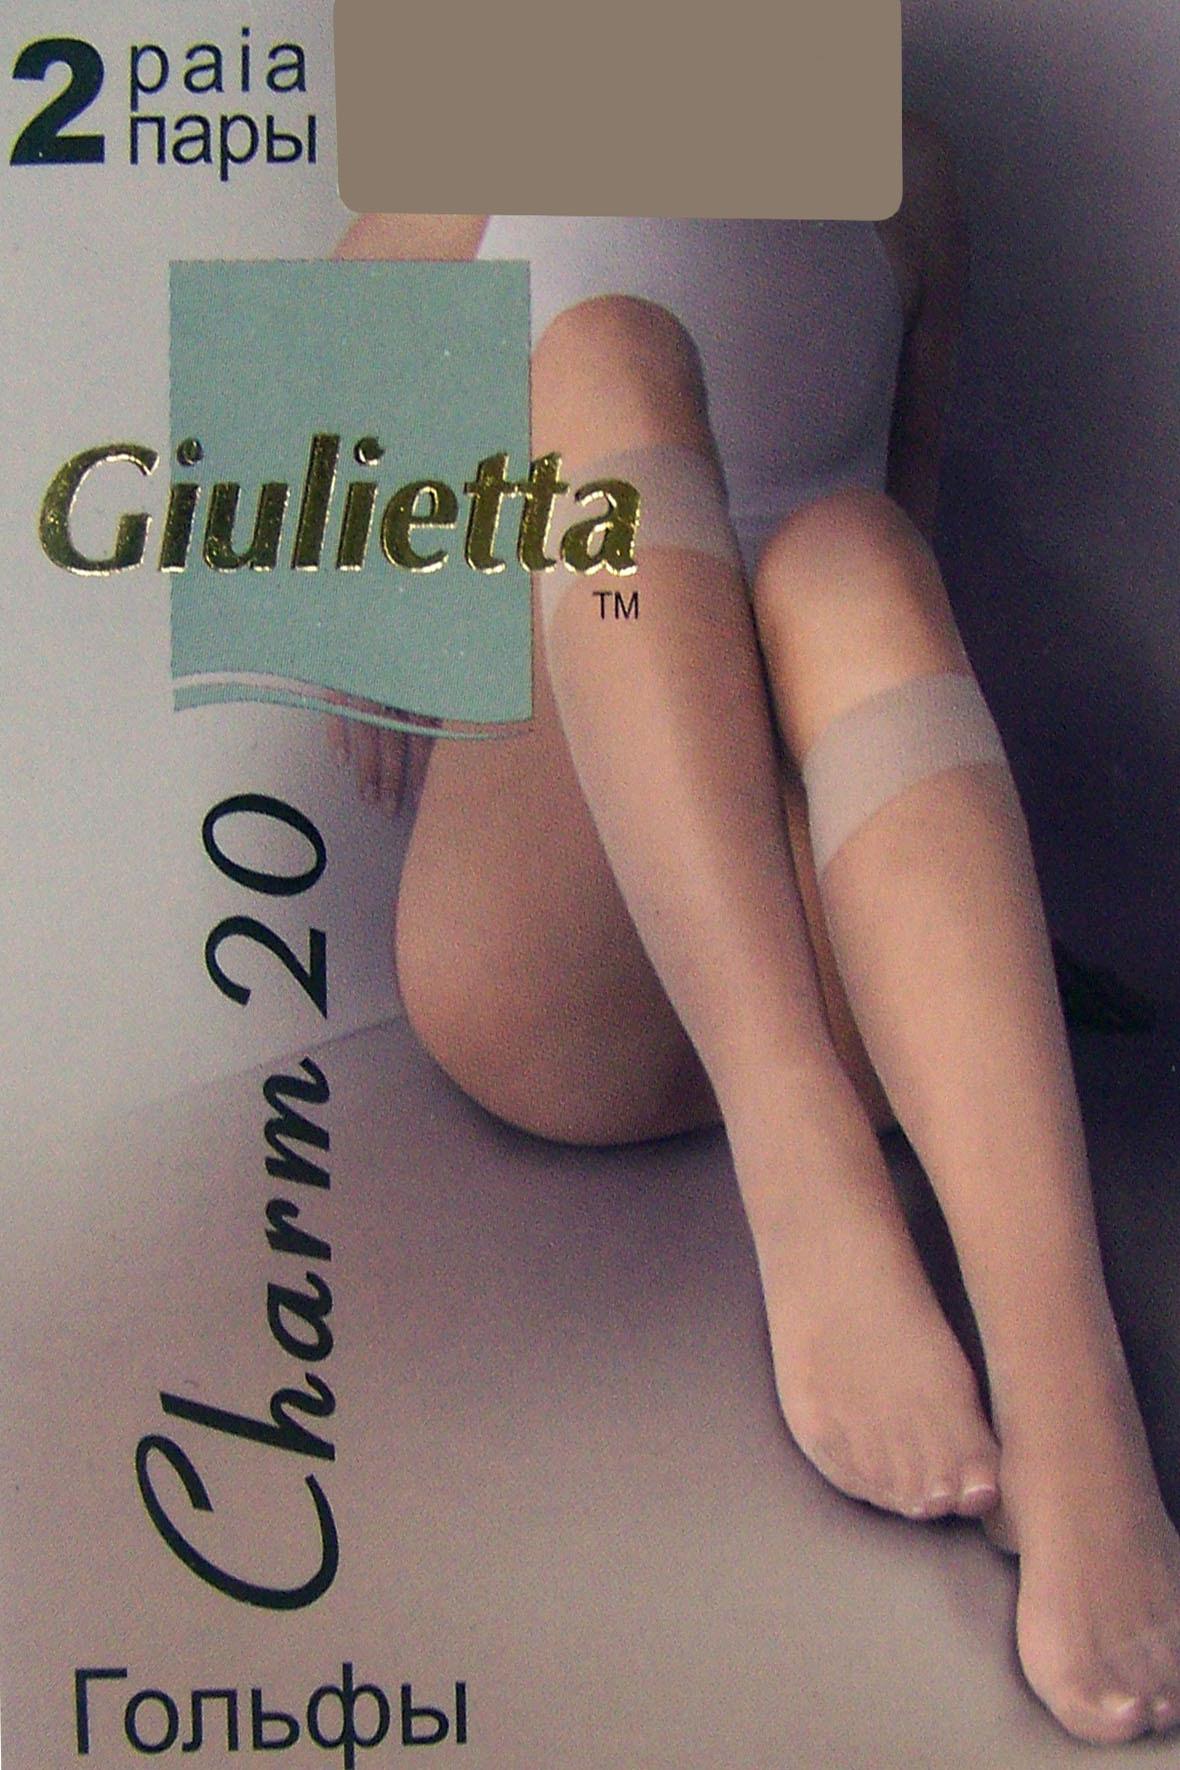 Гольфы Giulietta Charm (2 П.) 20